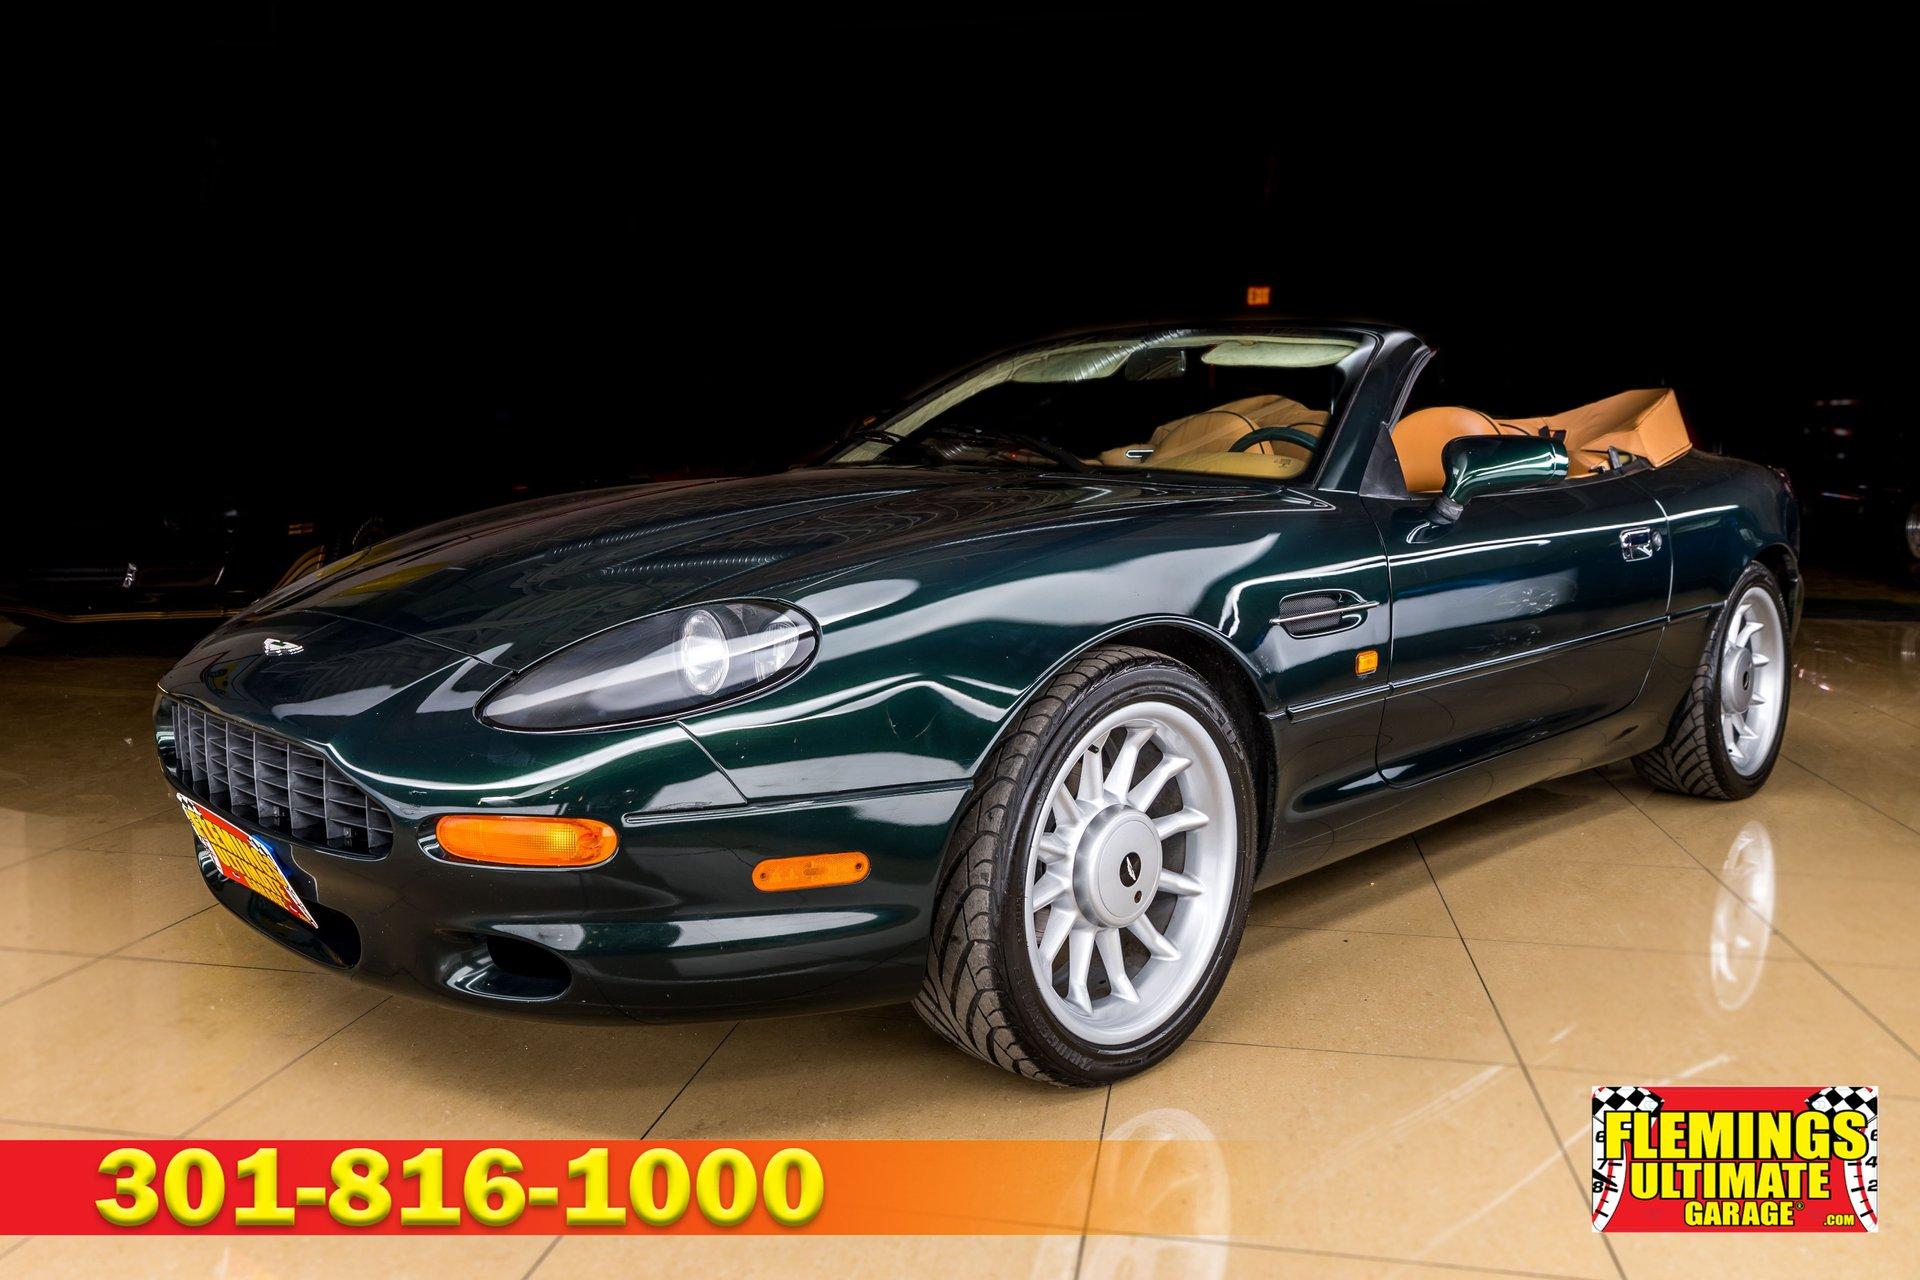 1998 Aston Martin Db7 Vantage Volante Convertible For Sale 225957 Motorious